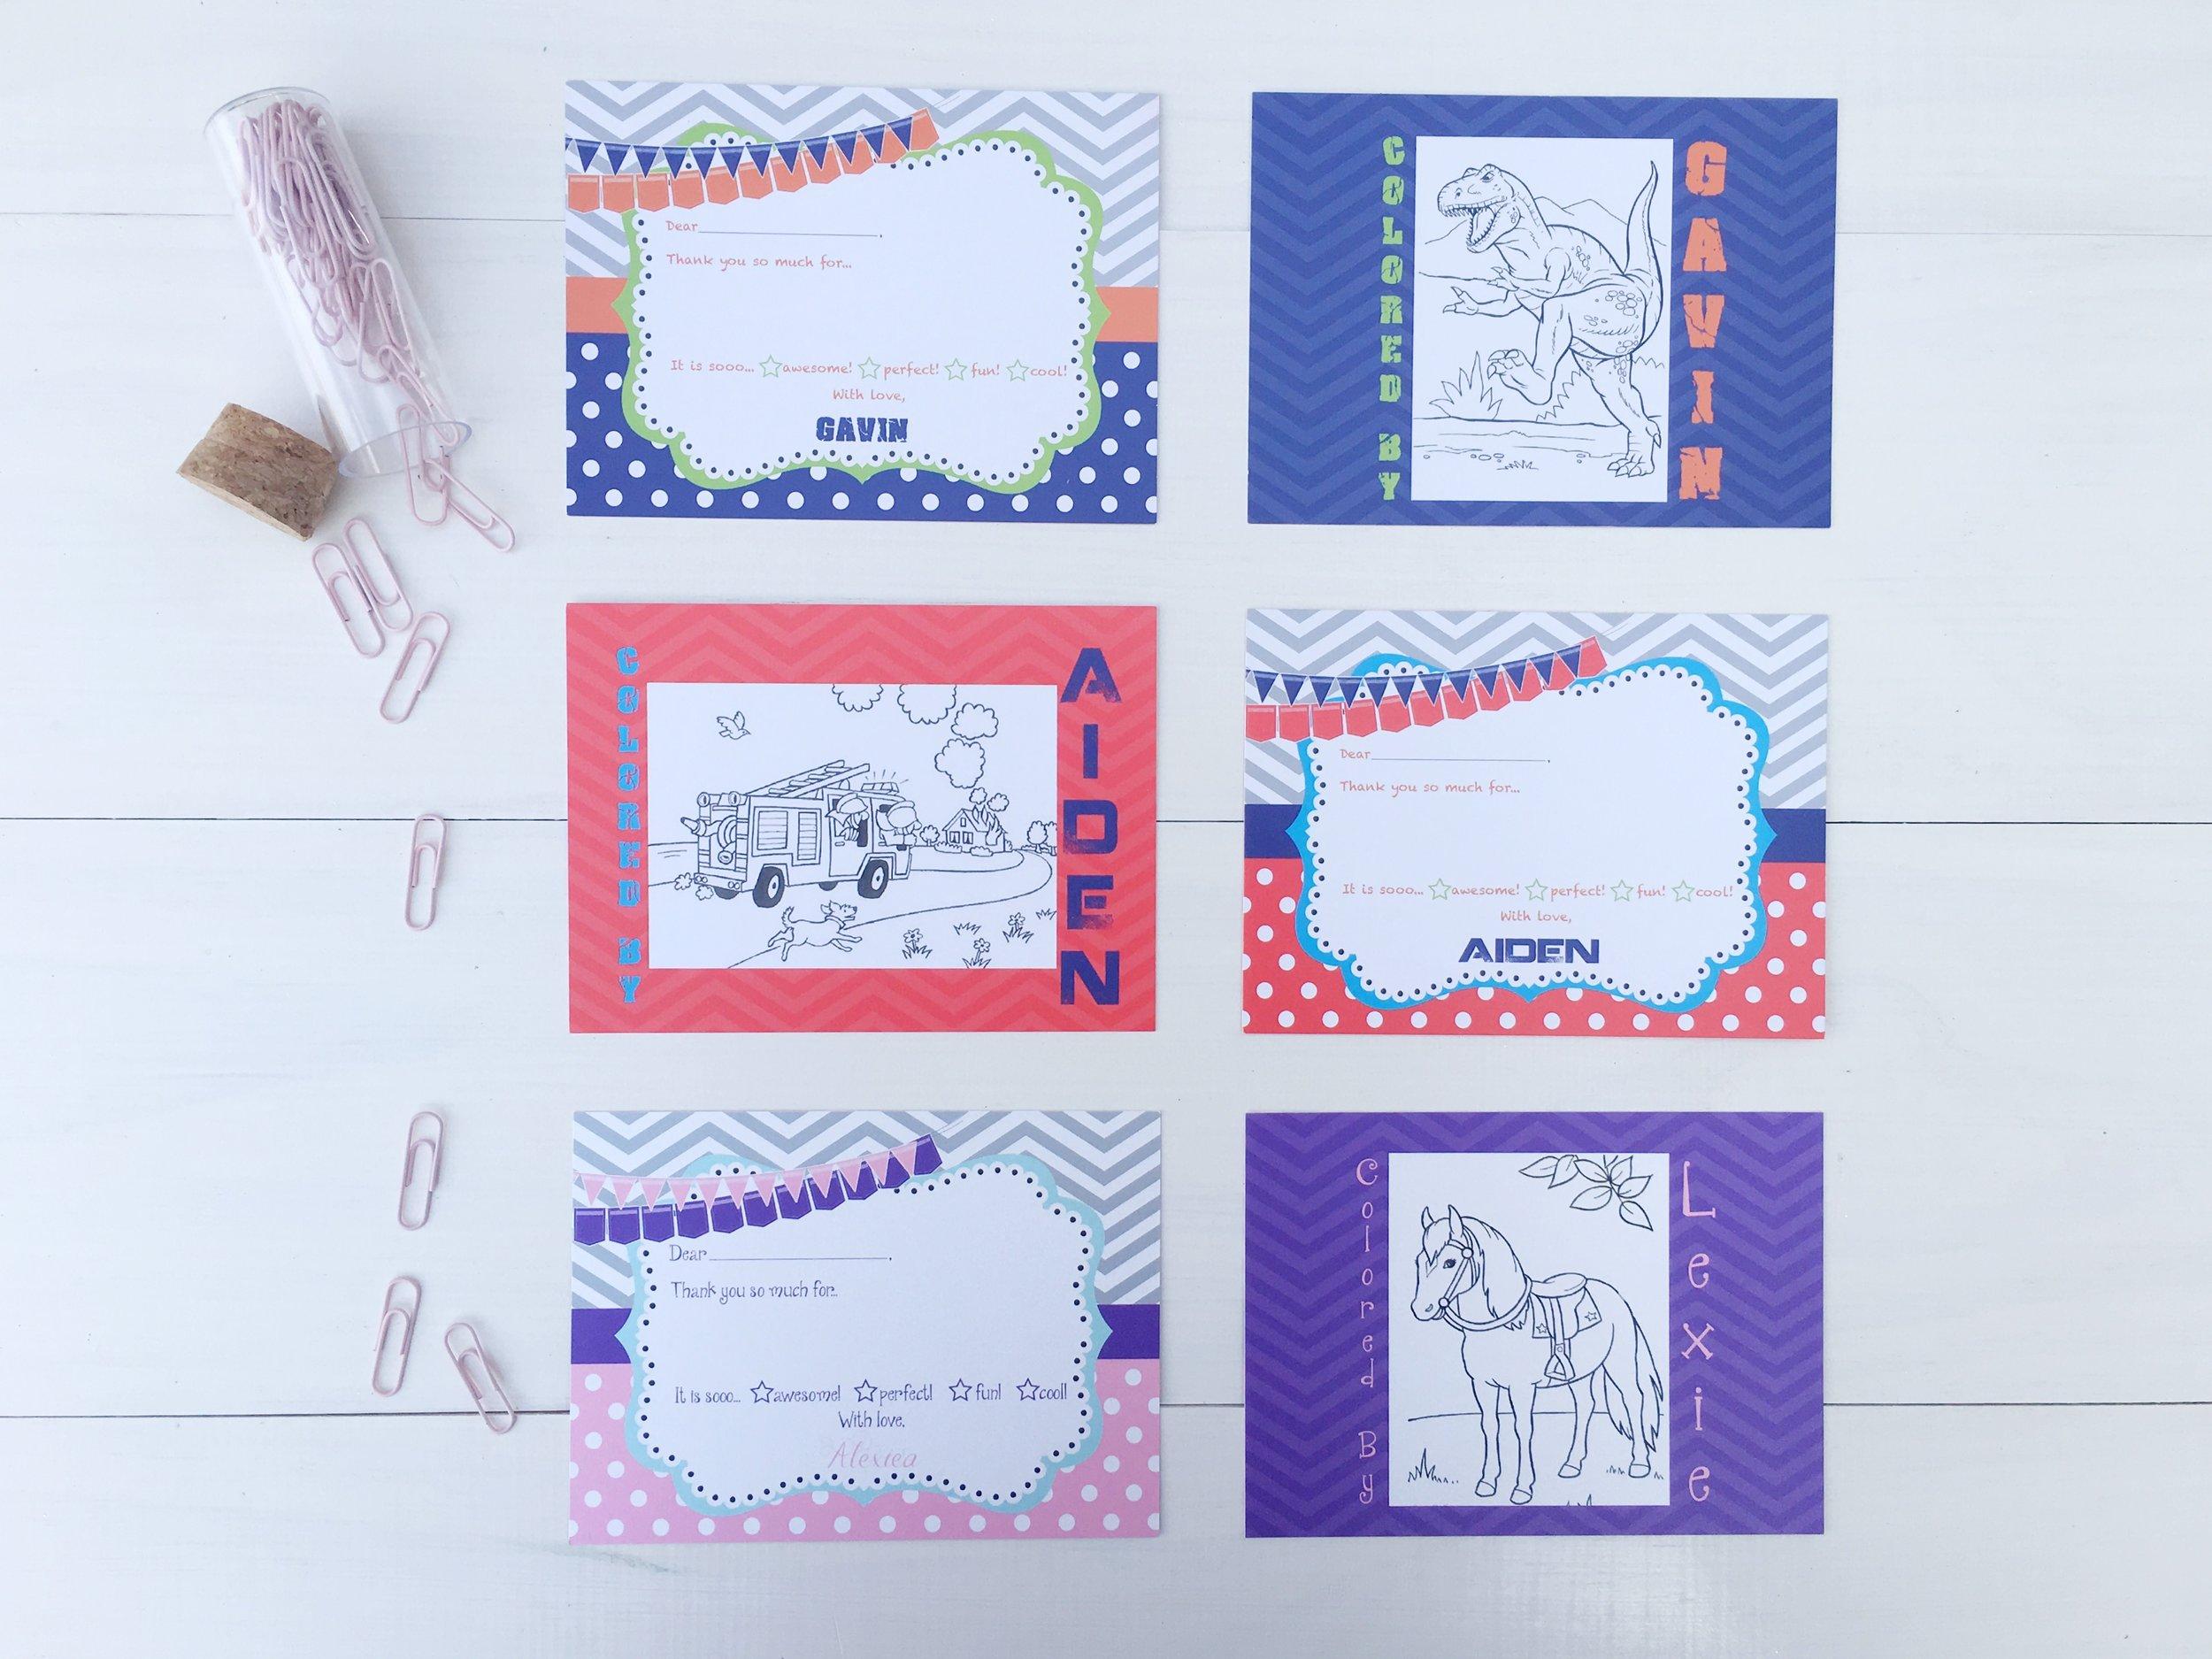 jsd kids thank you note cards.jpg